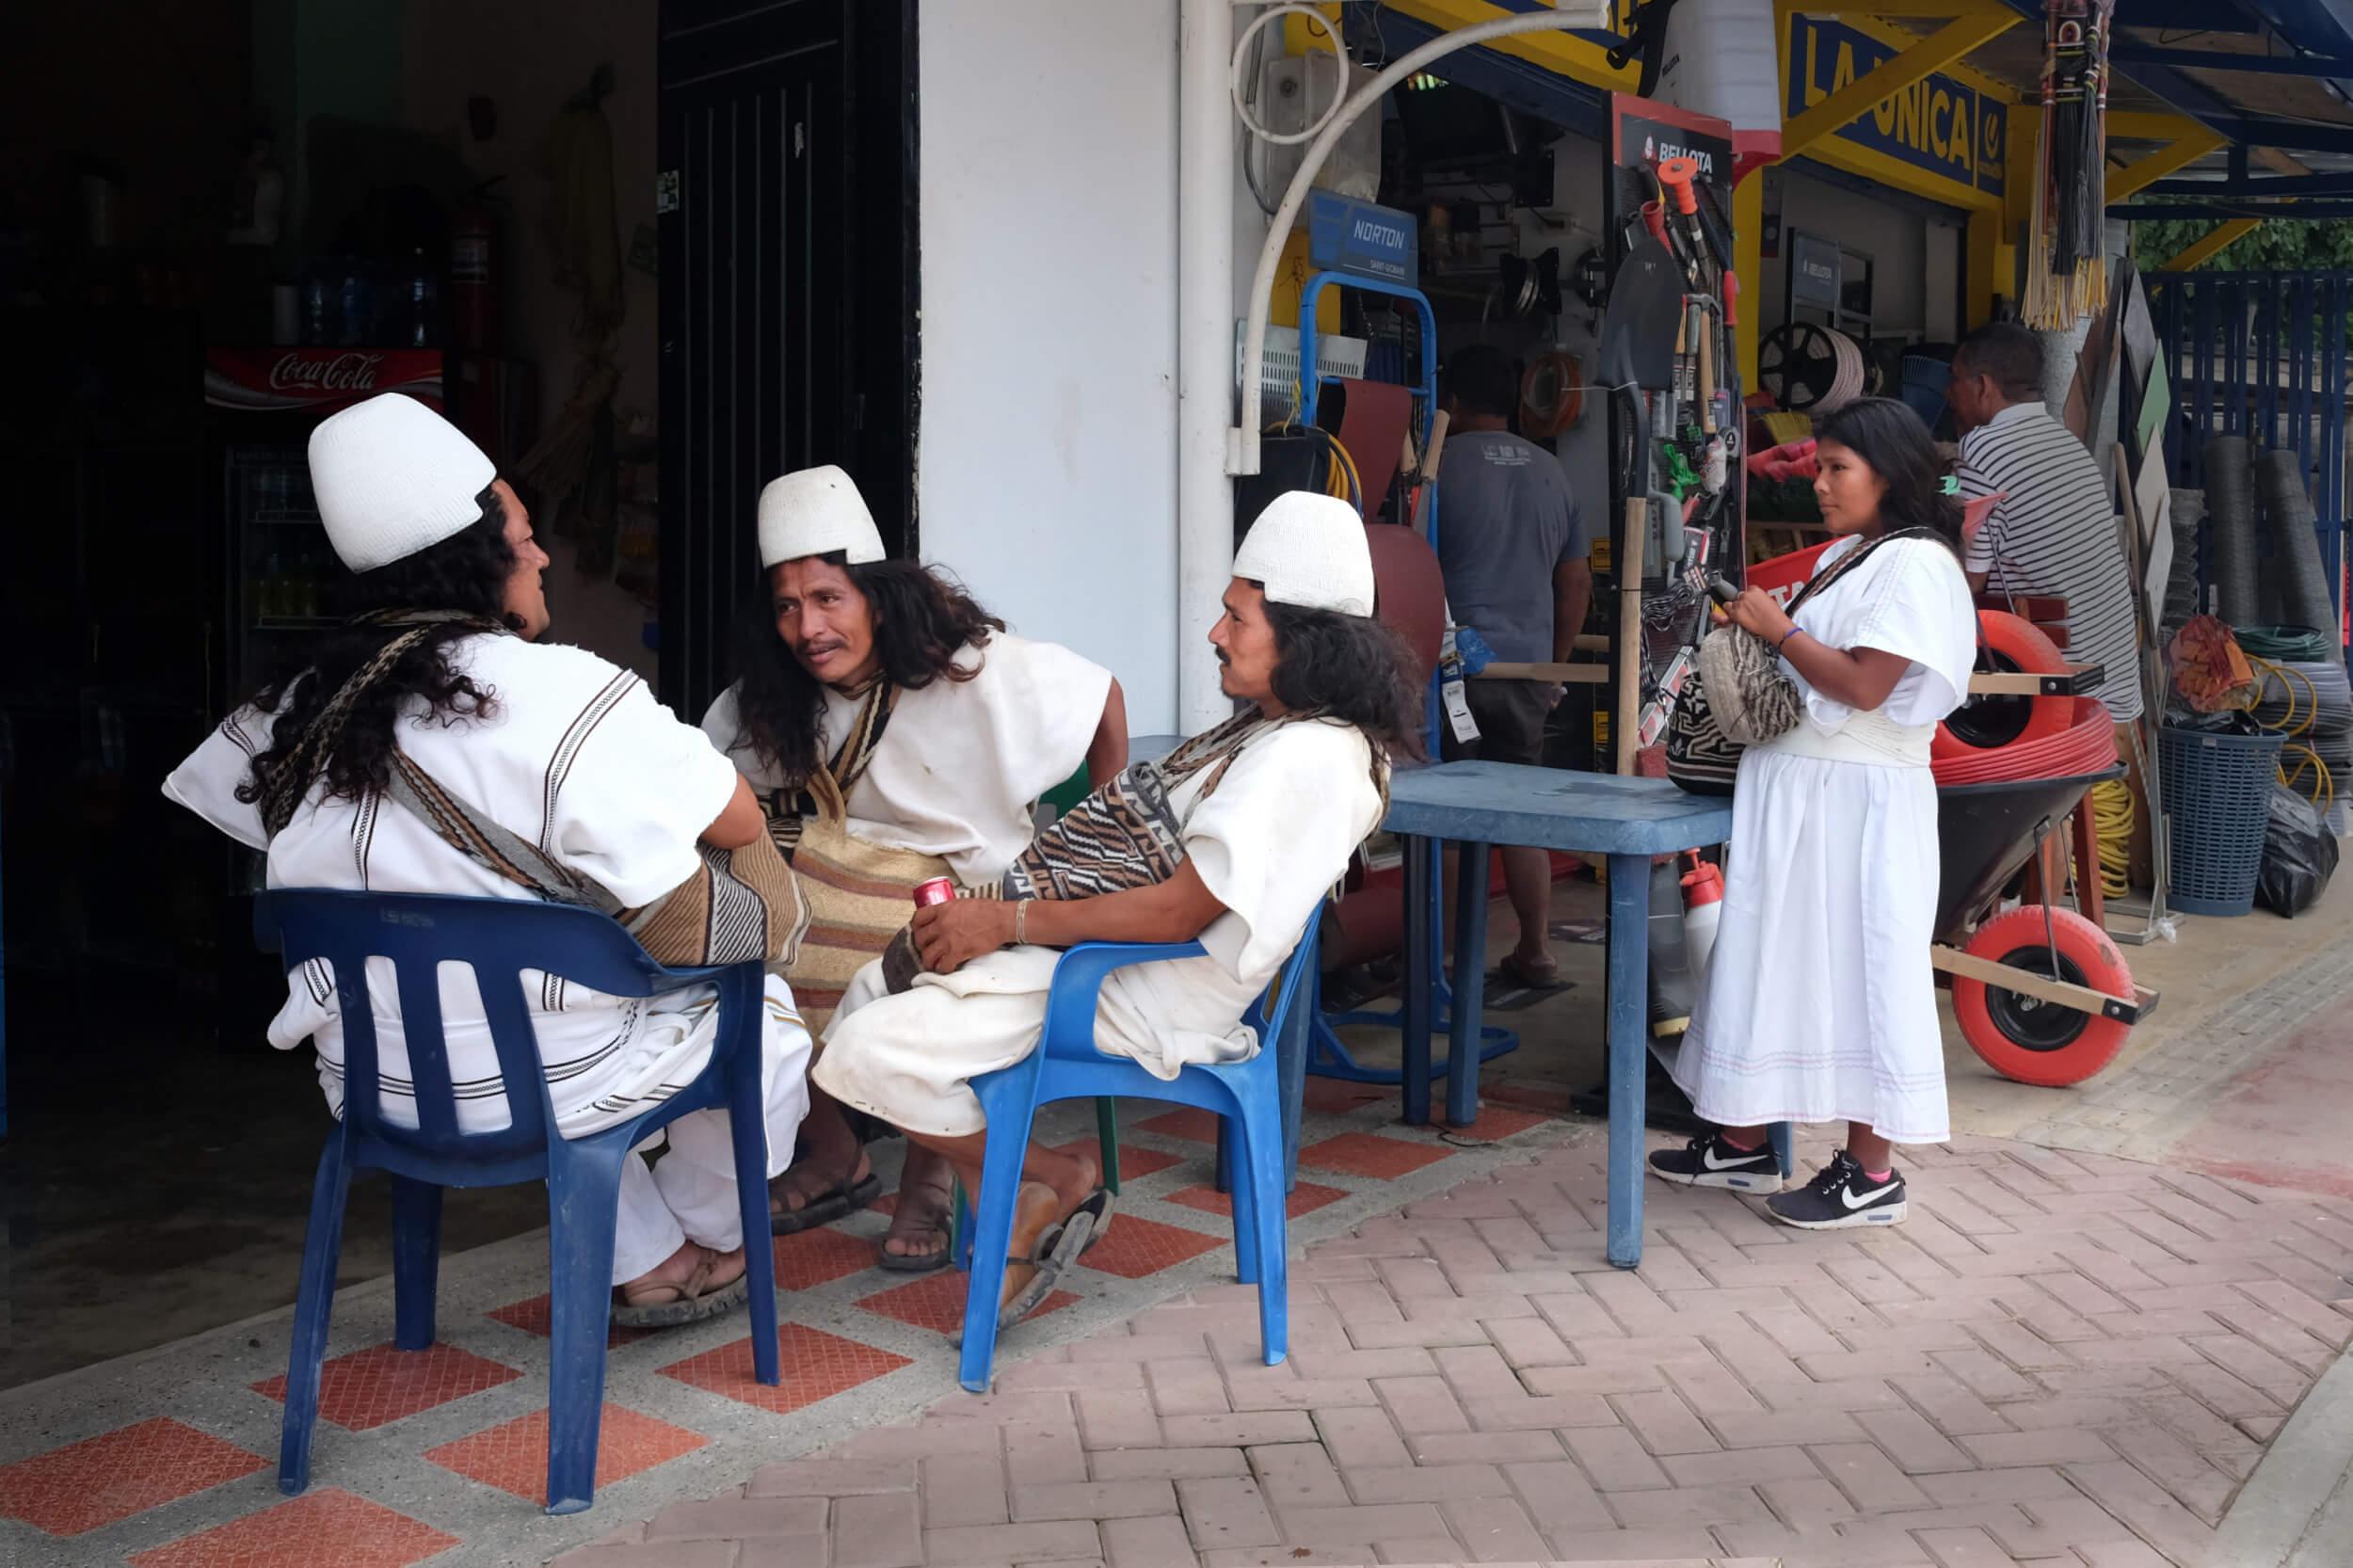 arhuaco men enjoying a cola